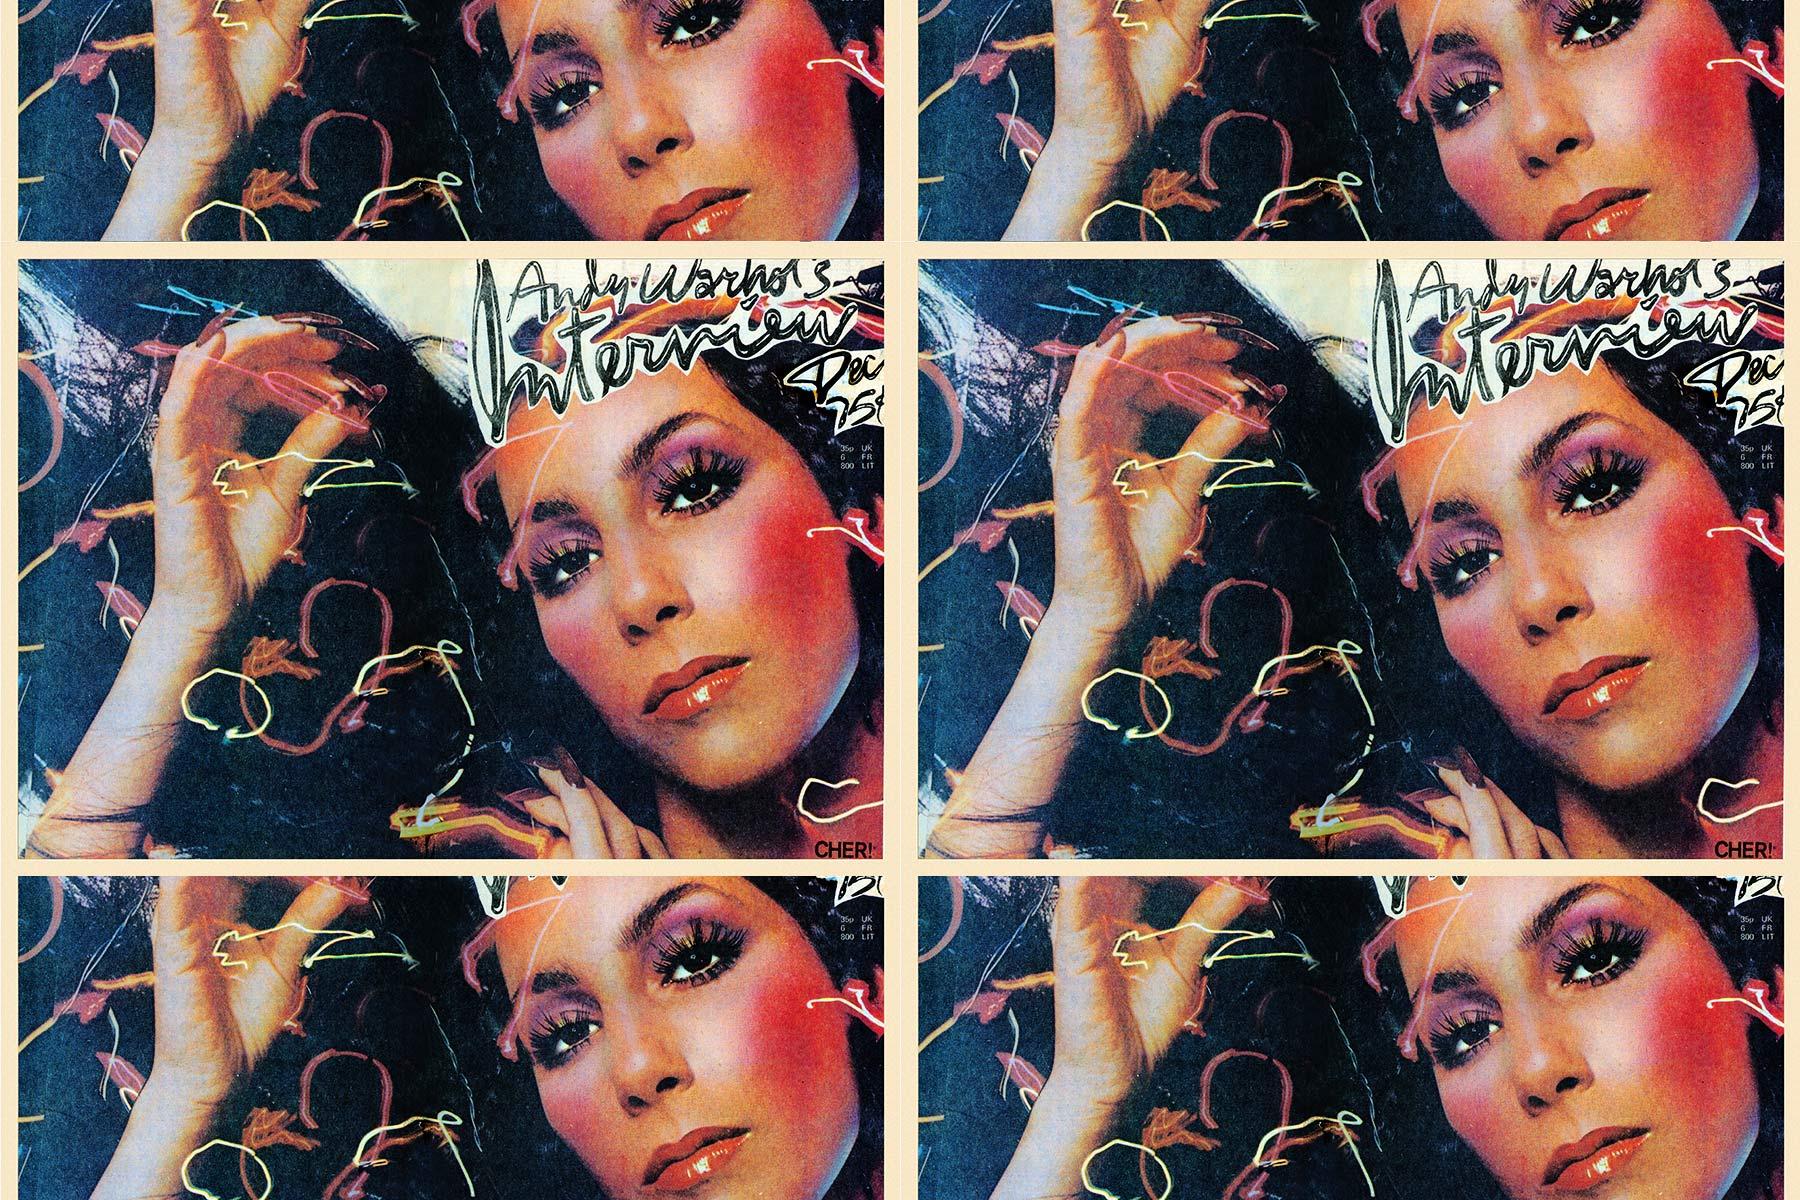 Cher by Richard Bernstein. Starmaker by Roger Padhila & Mauricio Padhila. Rizzoli Books. Ponyboy magazine.